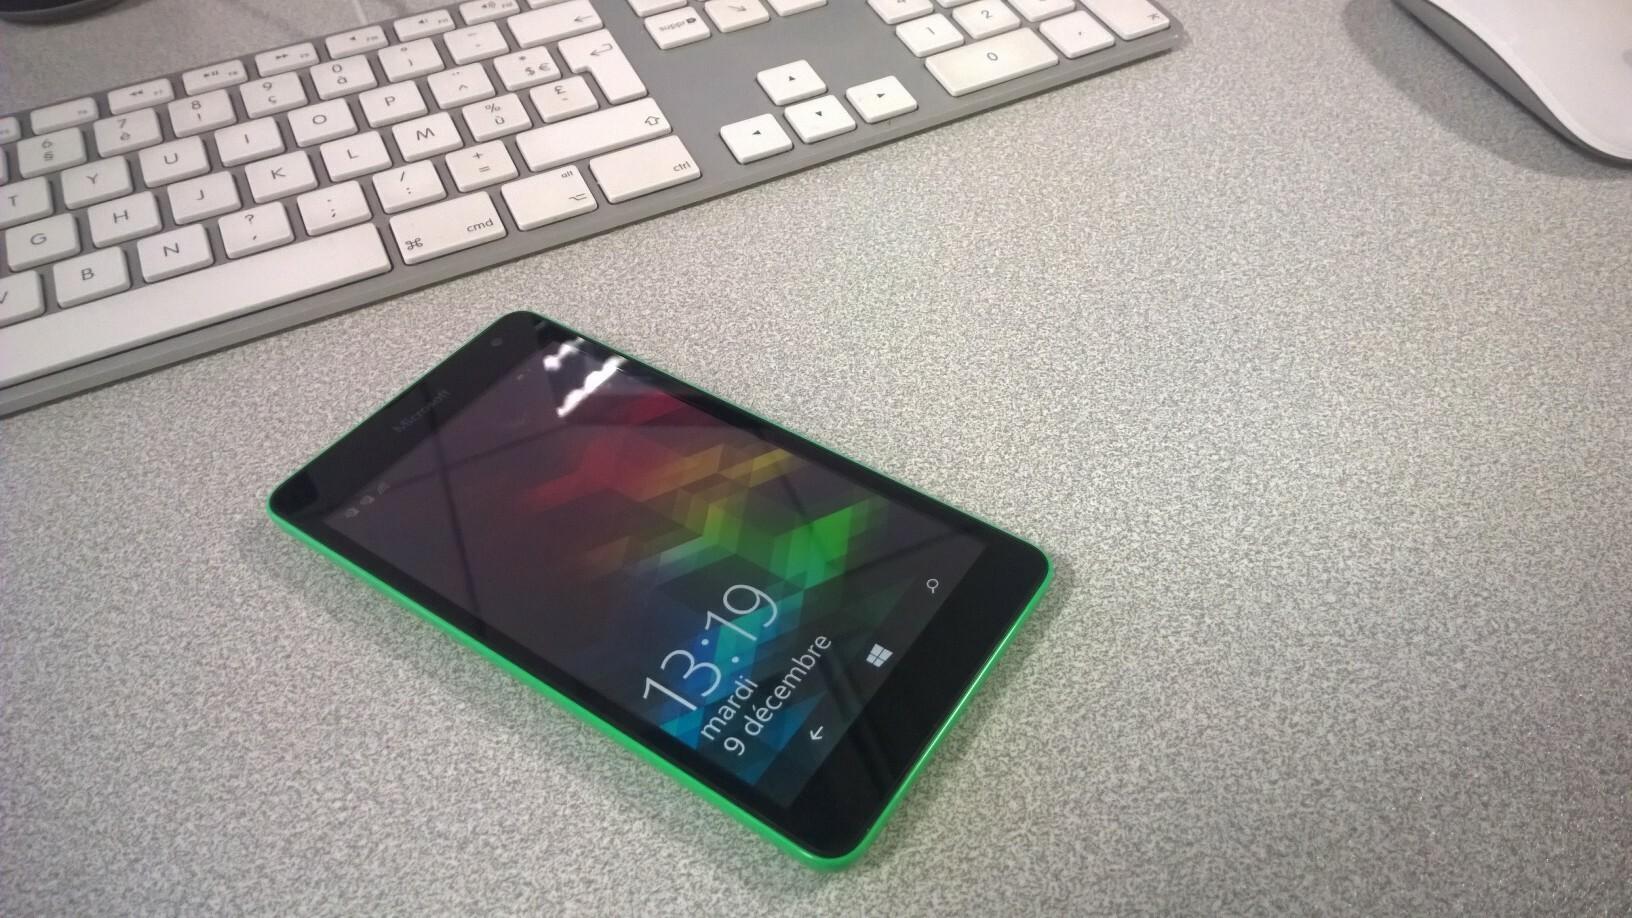 [Test] Test du Lumia 535, le premier Lumia de la marque Microsoft